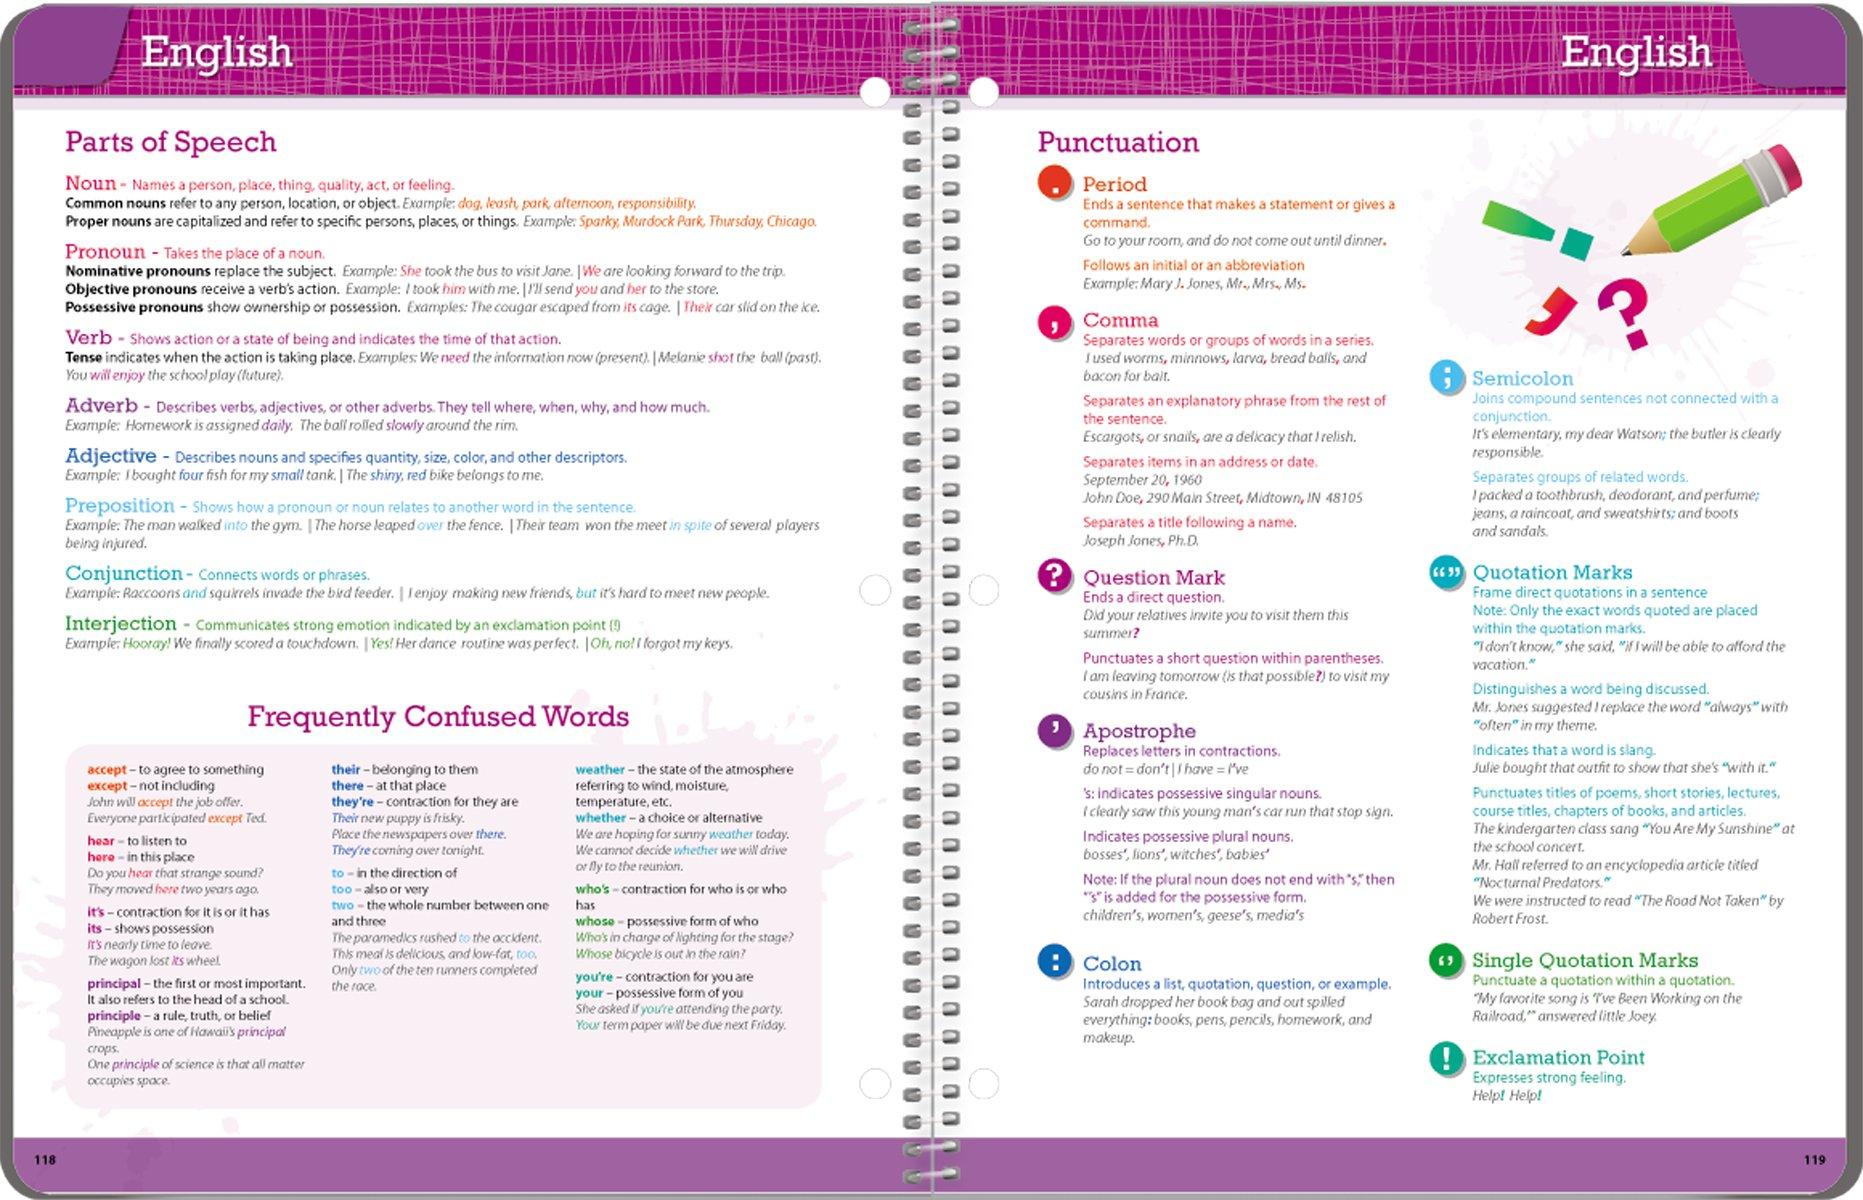 Student Planner 2016 - 2017 School Year Planner Elementary School Content 8.5'' x 11'' by School Datebooks (Image #8)